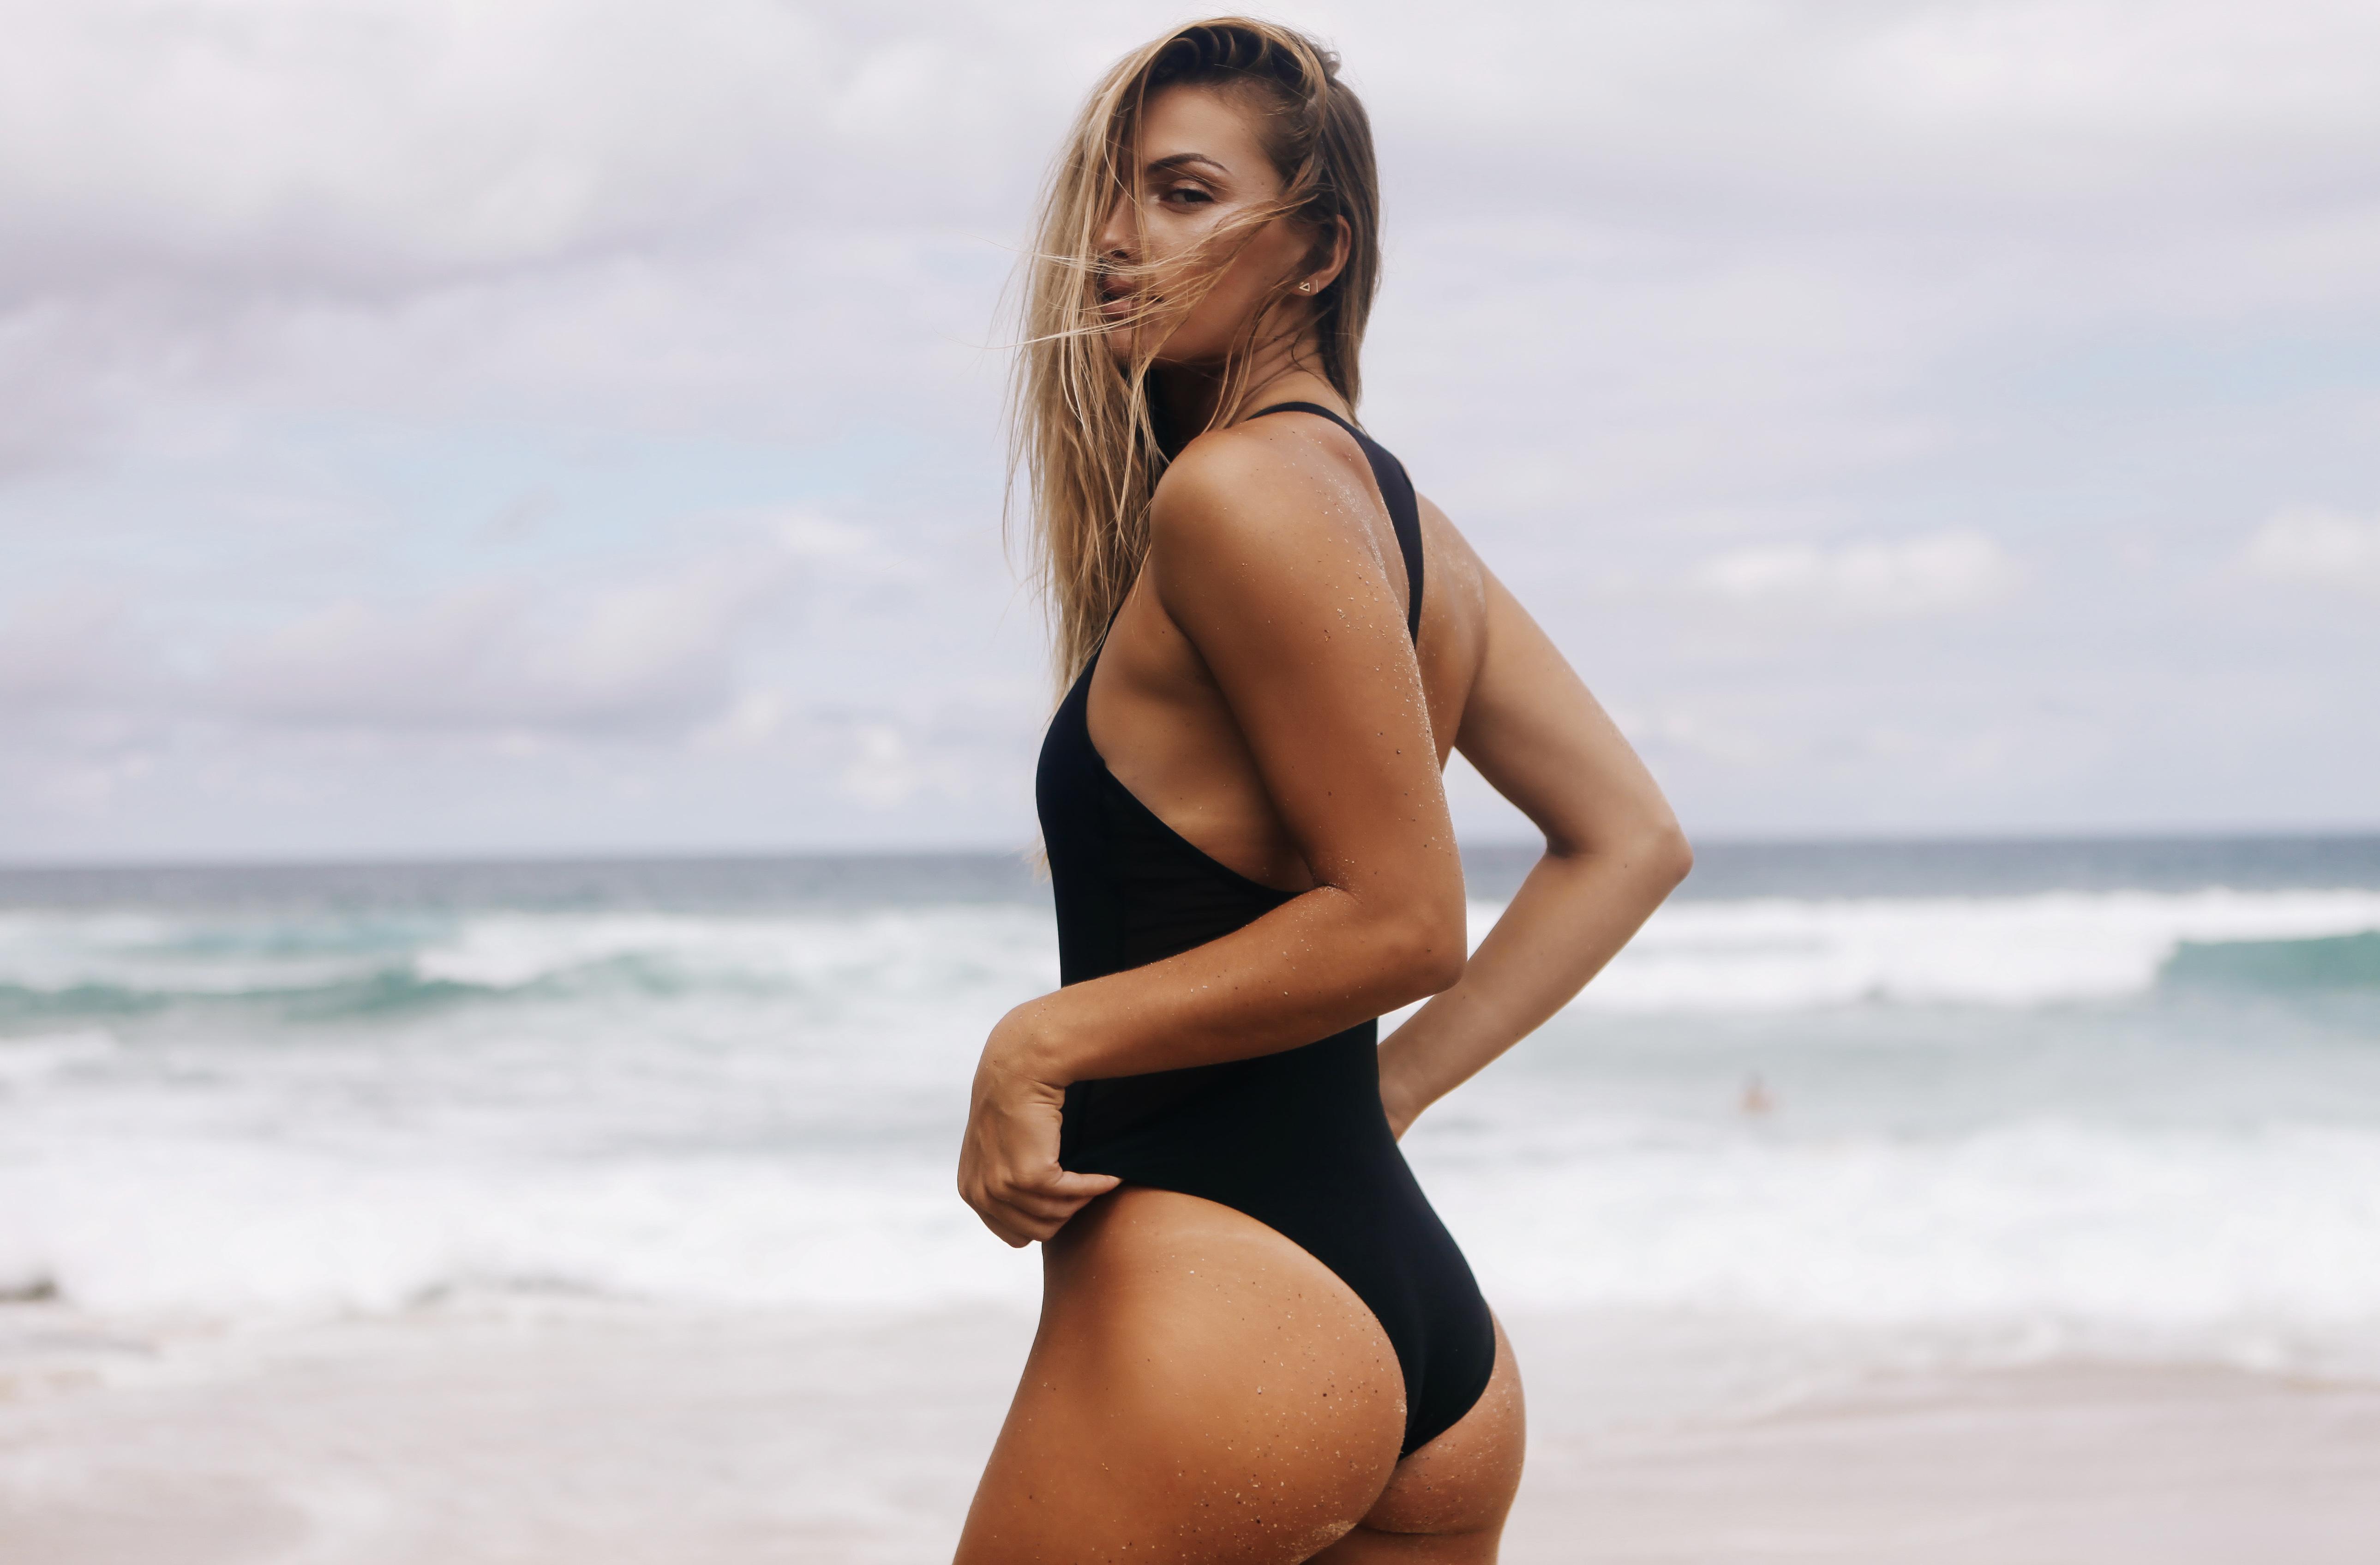 Oceana Strachan nudes (78 fotos), video Sideboobs, YouTube, bra 2018